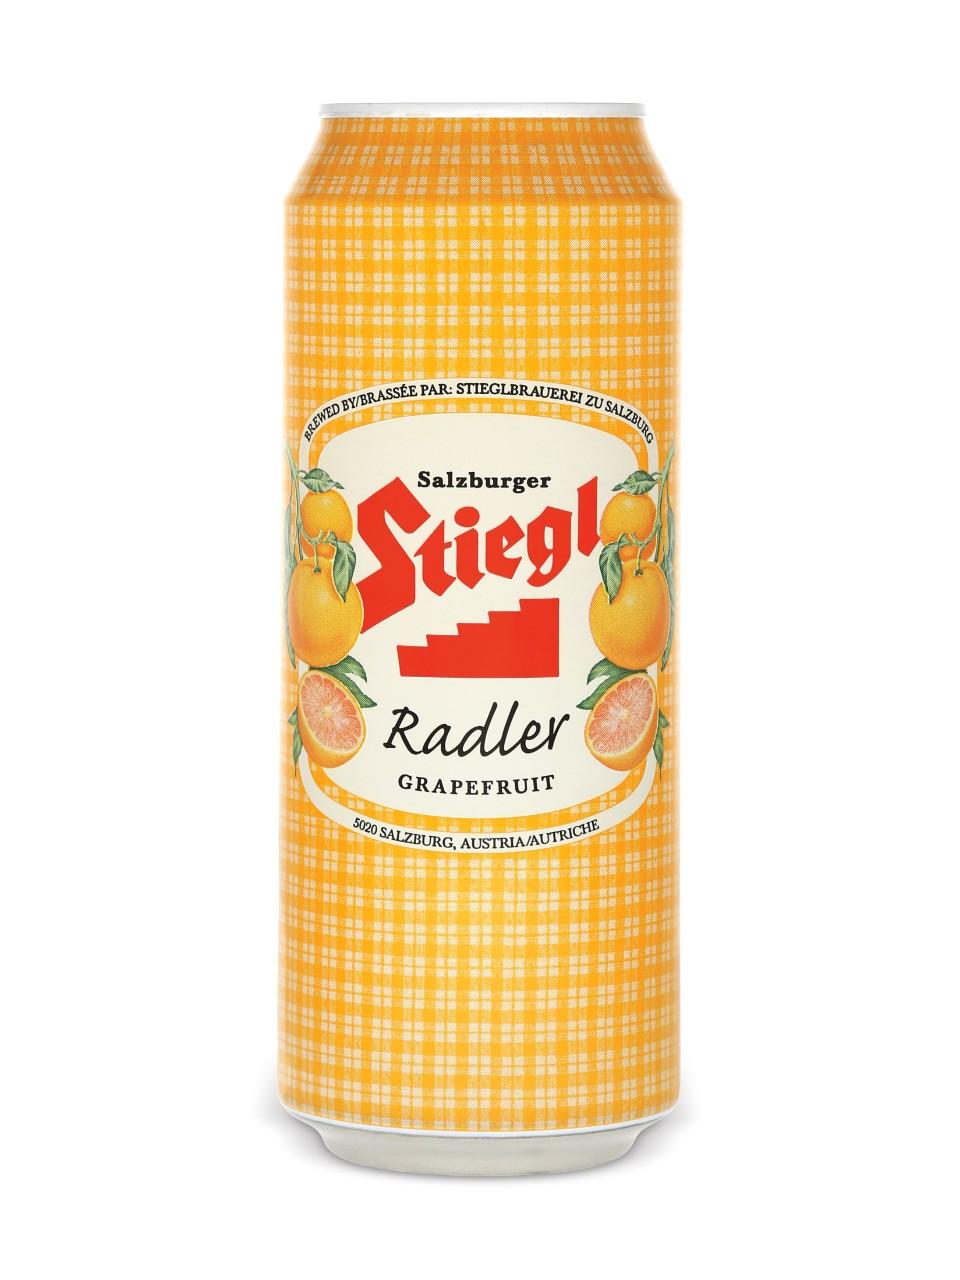 Stiegl Grapefruit Radler Lcbo